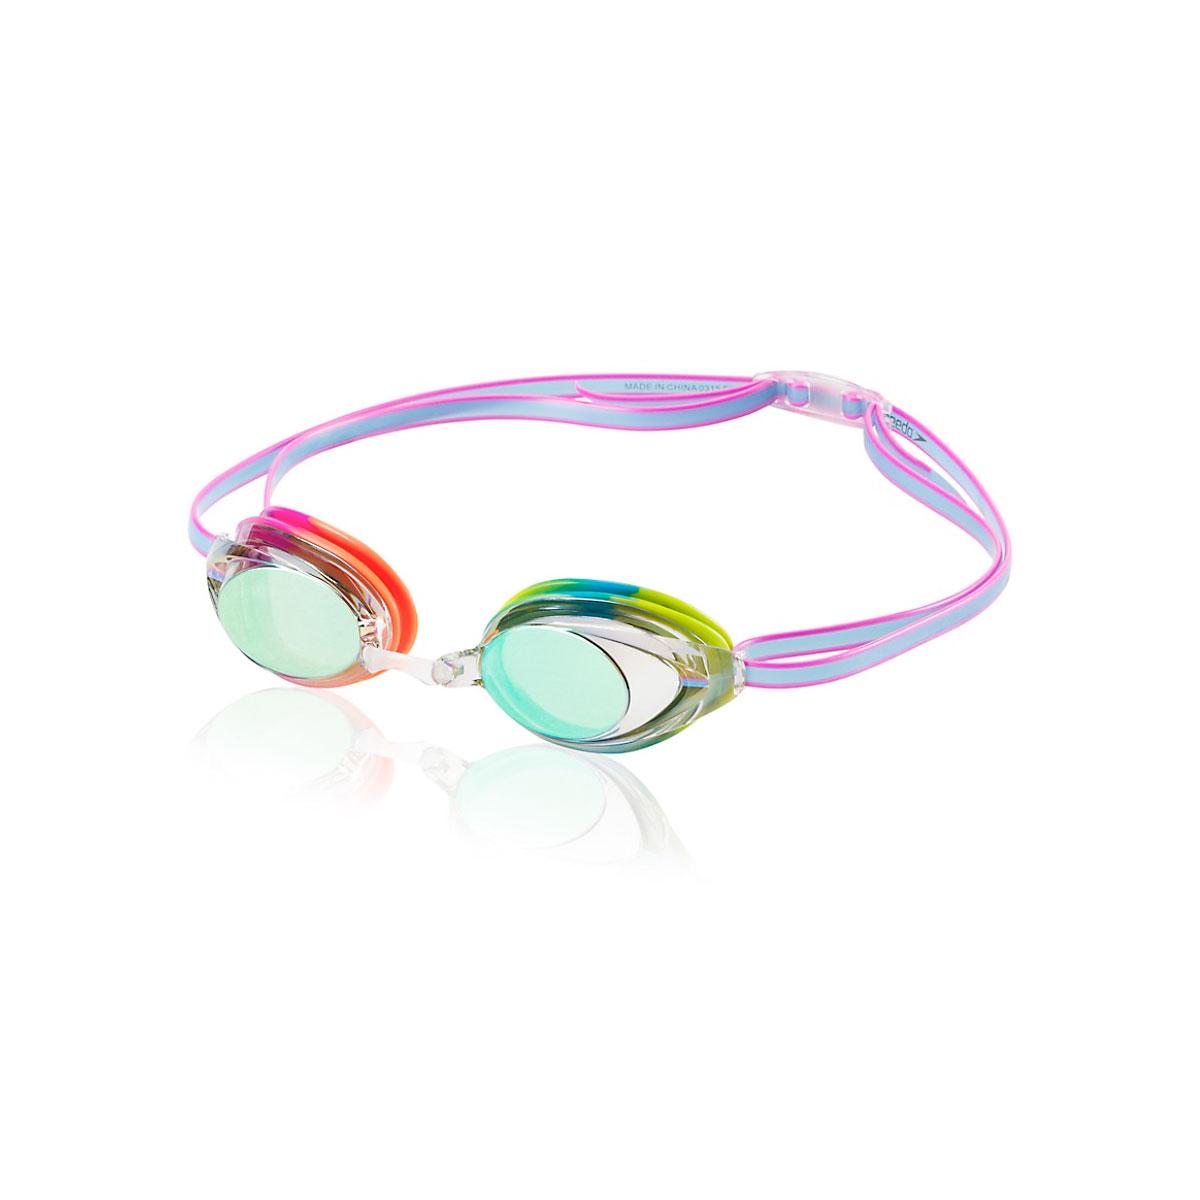 Jr. Vanquisher 2.0 Mirrored Swim Goggles, Rainbow, swatch